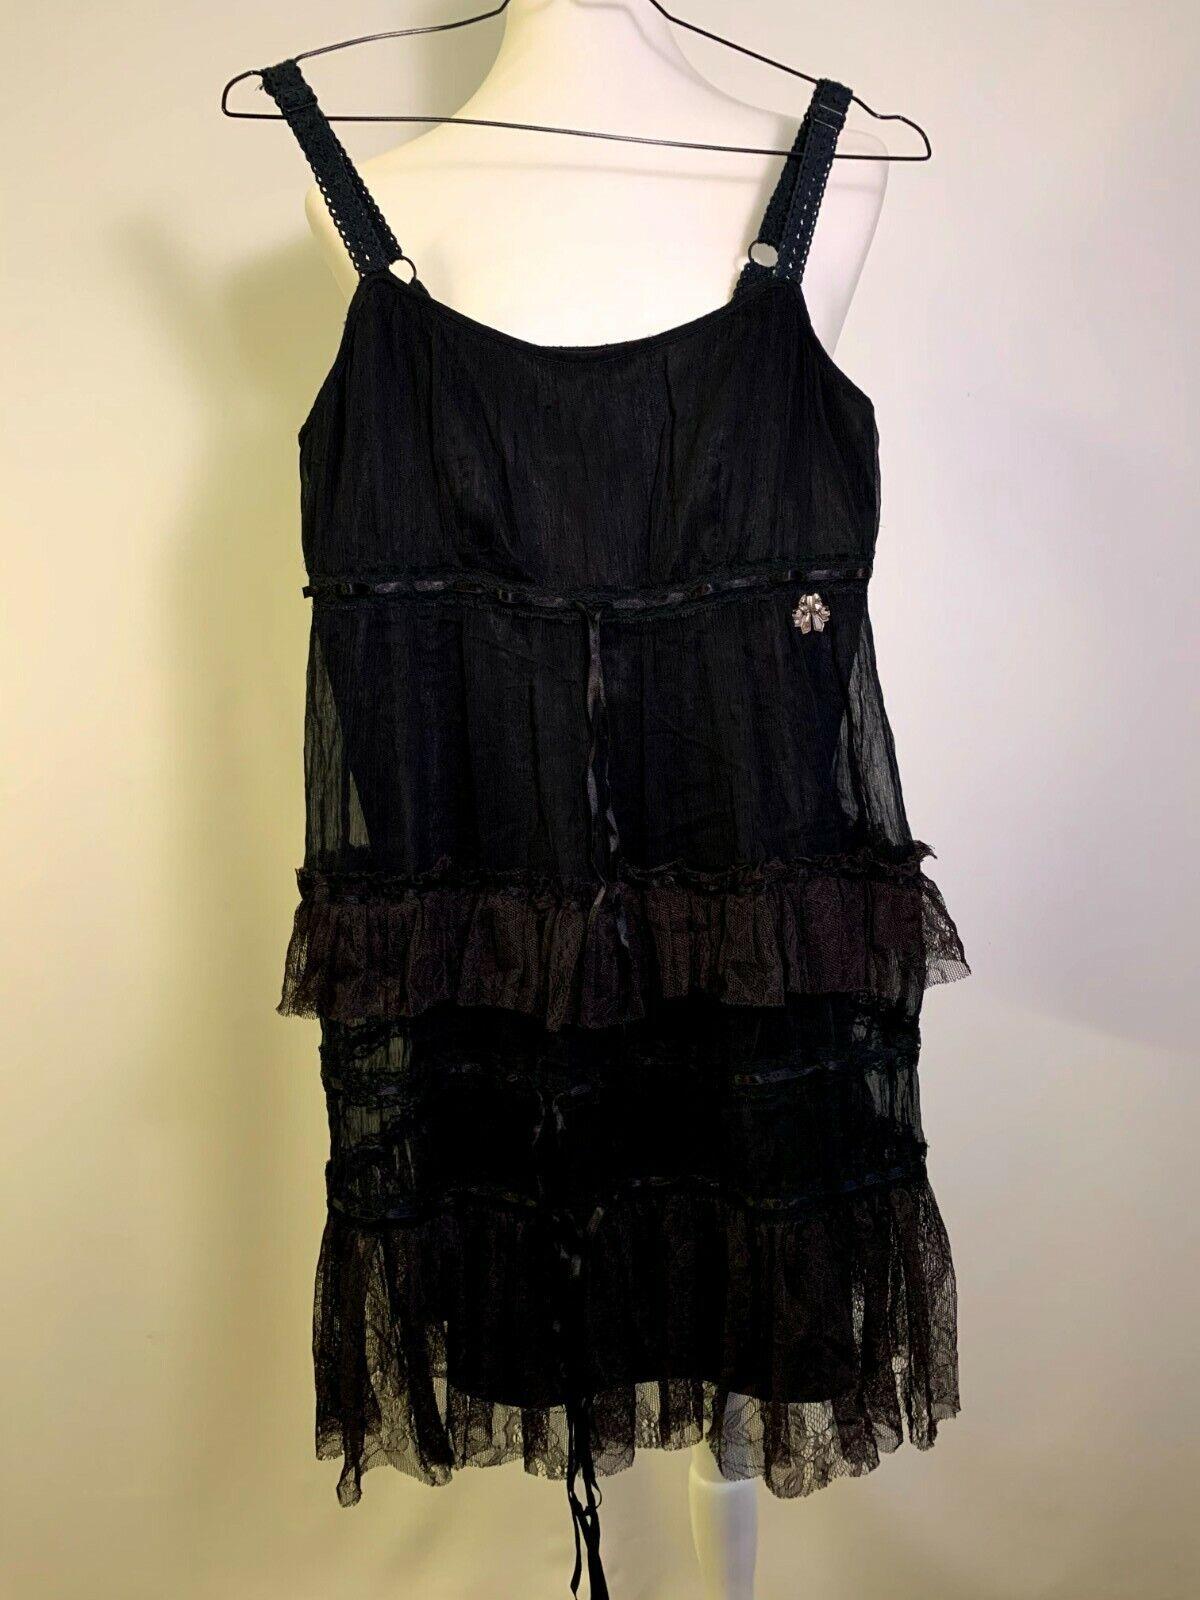 John Galliano Dress Womens Black Elegant Size M Size 38 Casual Summer